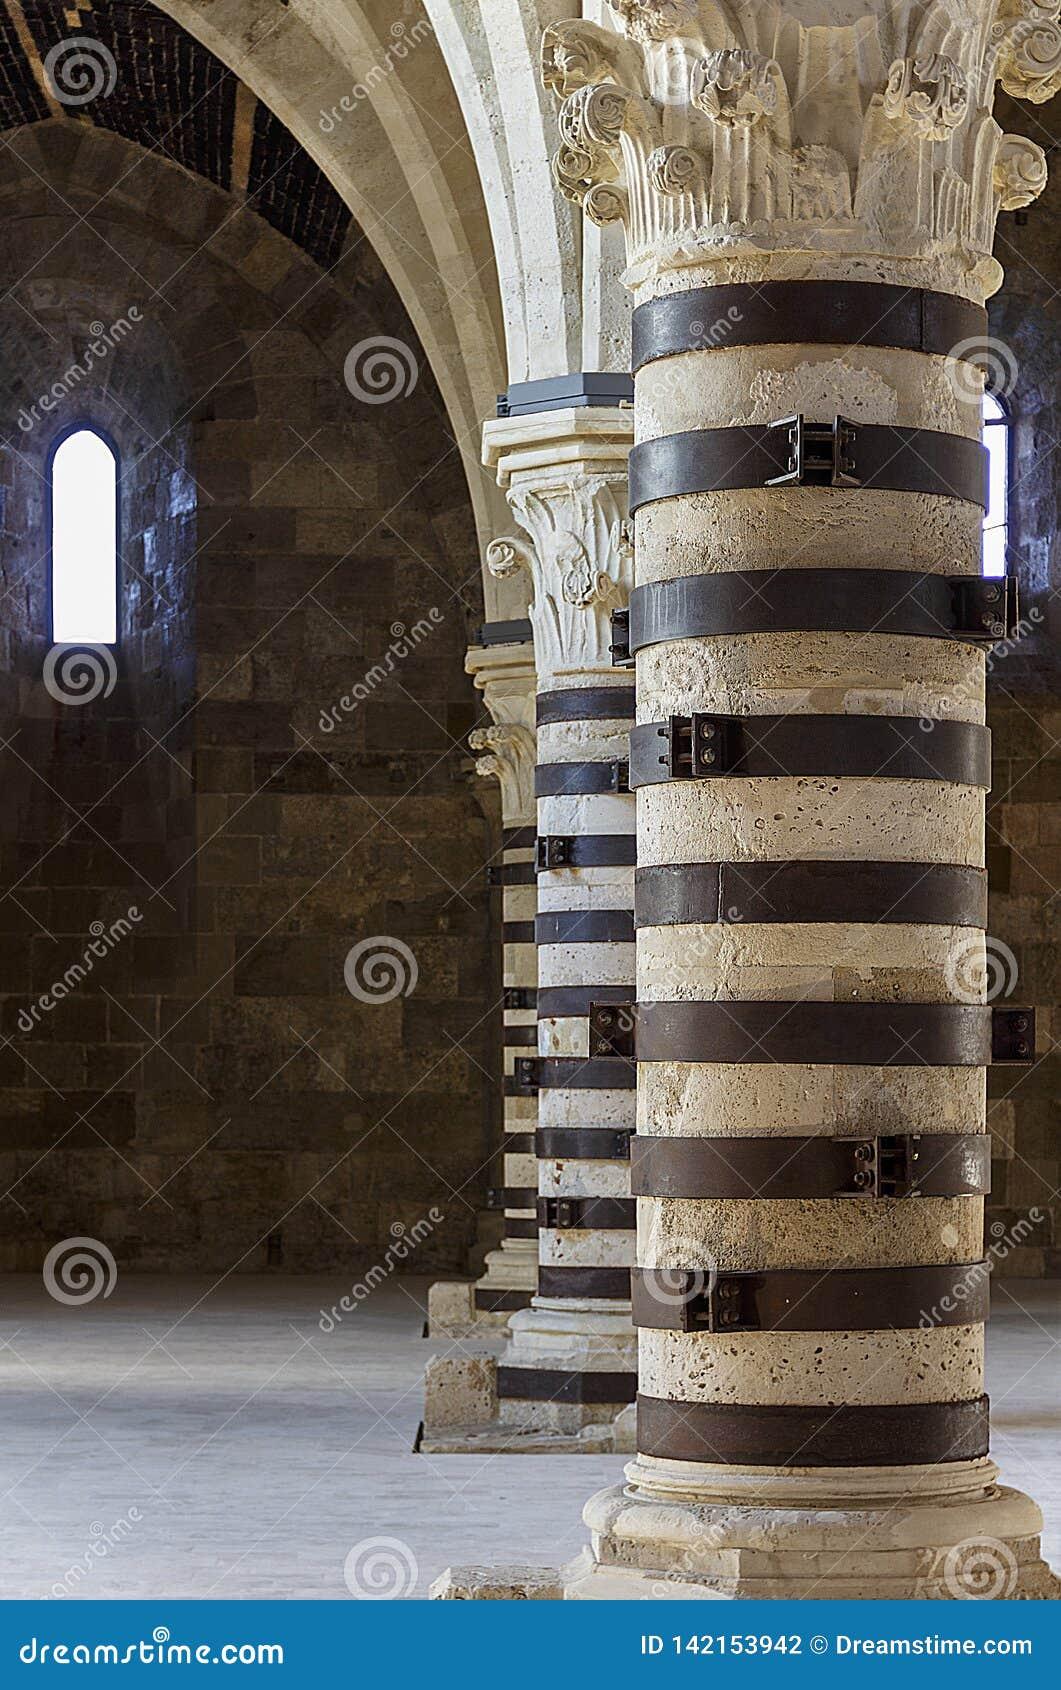 columns inside the Castello Maniace, Siracusa, Sicily